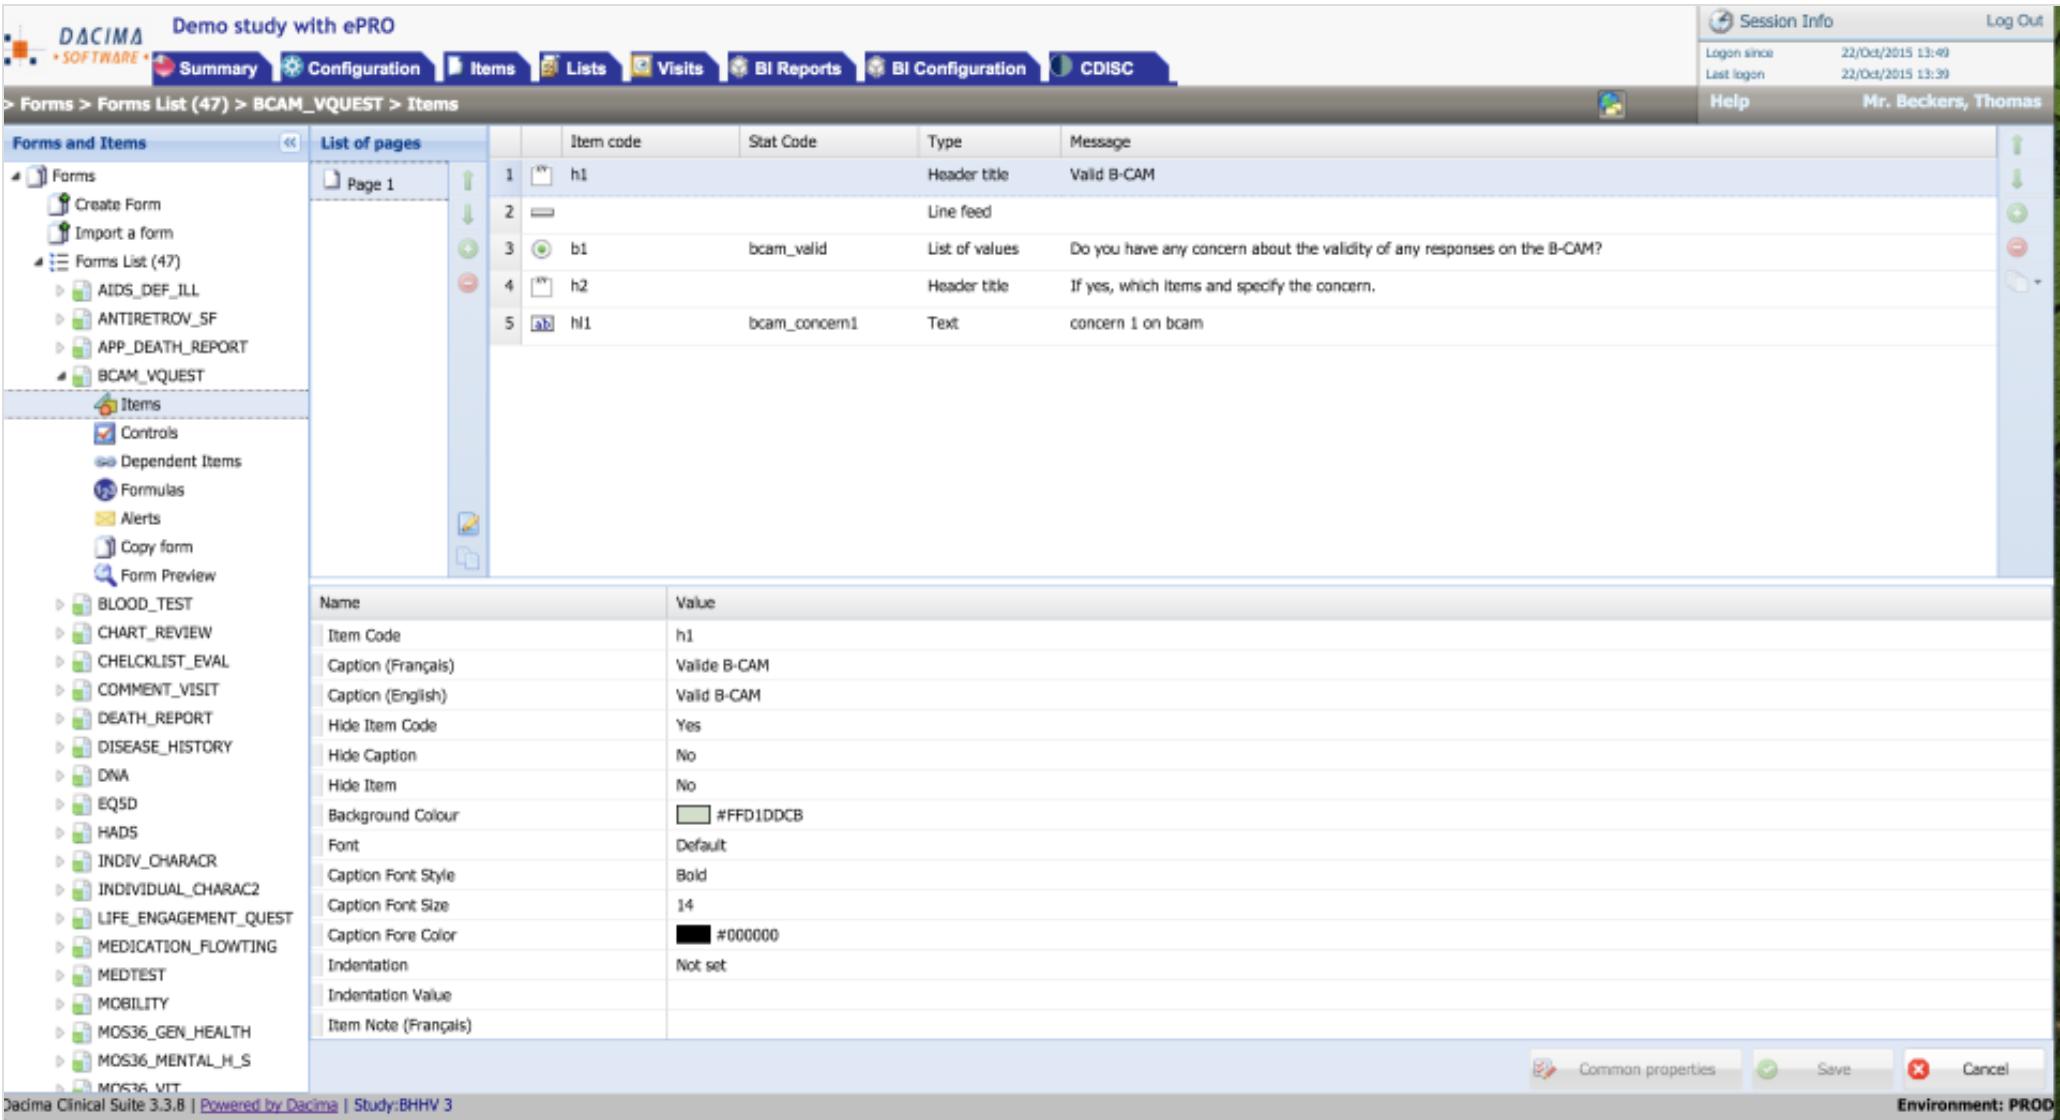 Dacima Clinical Suite designer module